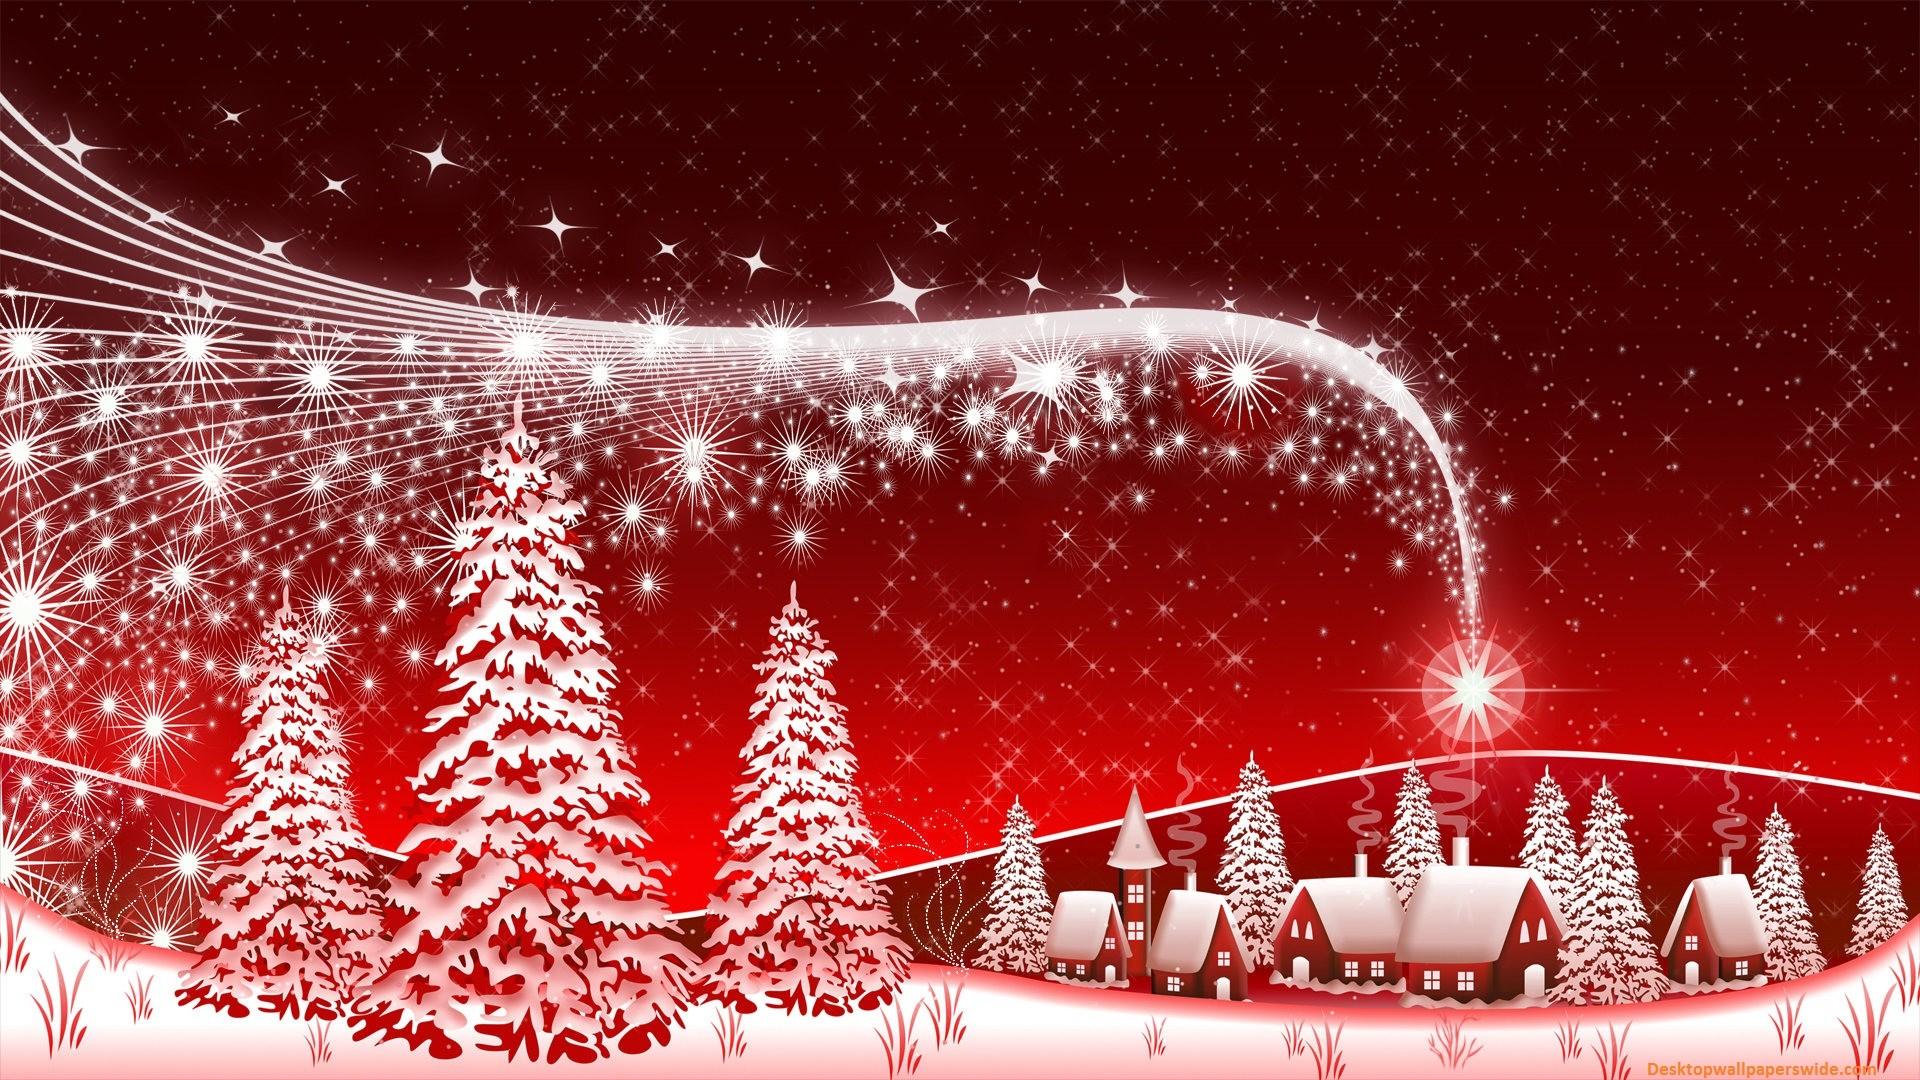 Christmas Wallpapers Hd   Free Christmas Hd Wallpapers   Widescreen .